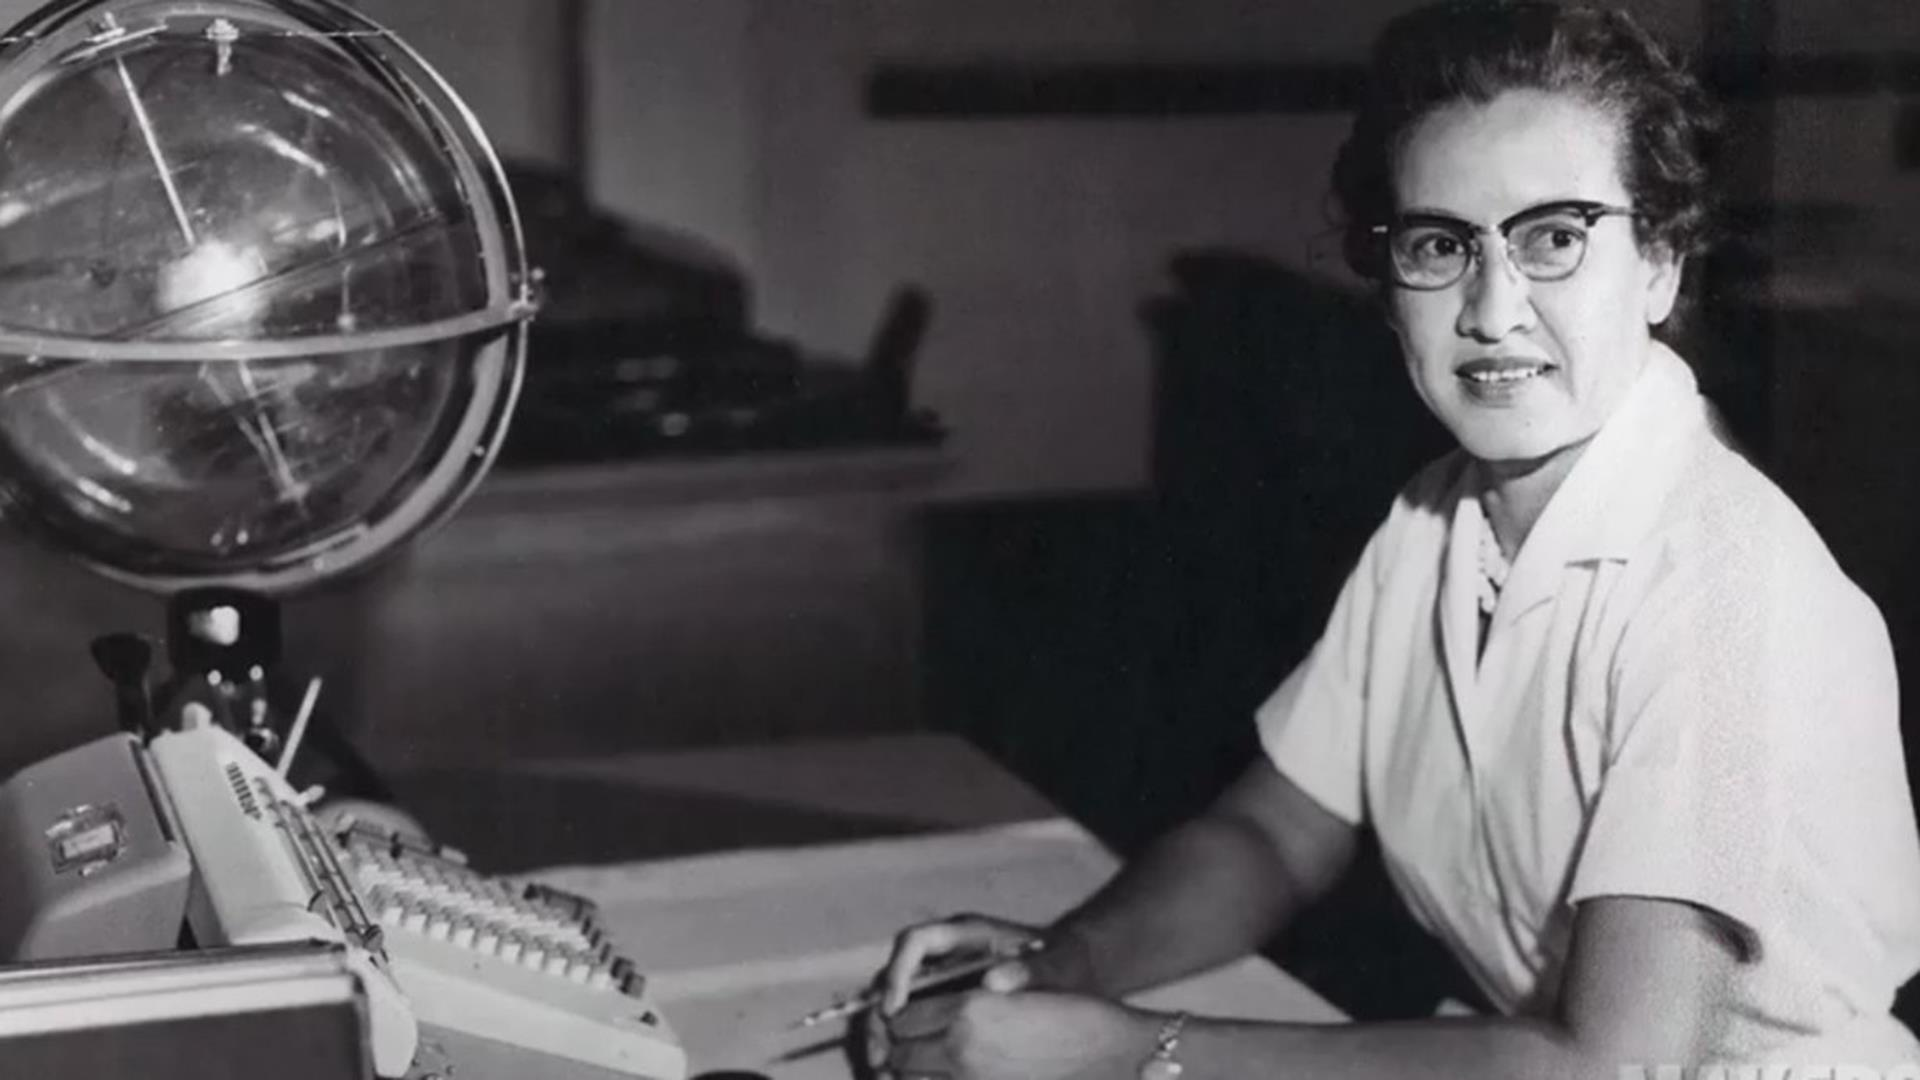 Katherine Johnson, NASA mathematician depicted in 'Hidden Figures,' dies at 101